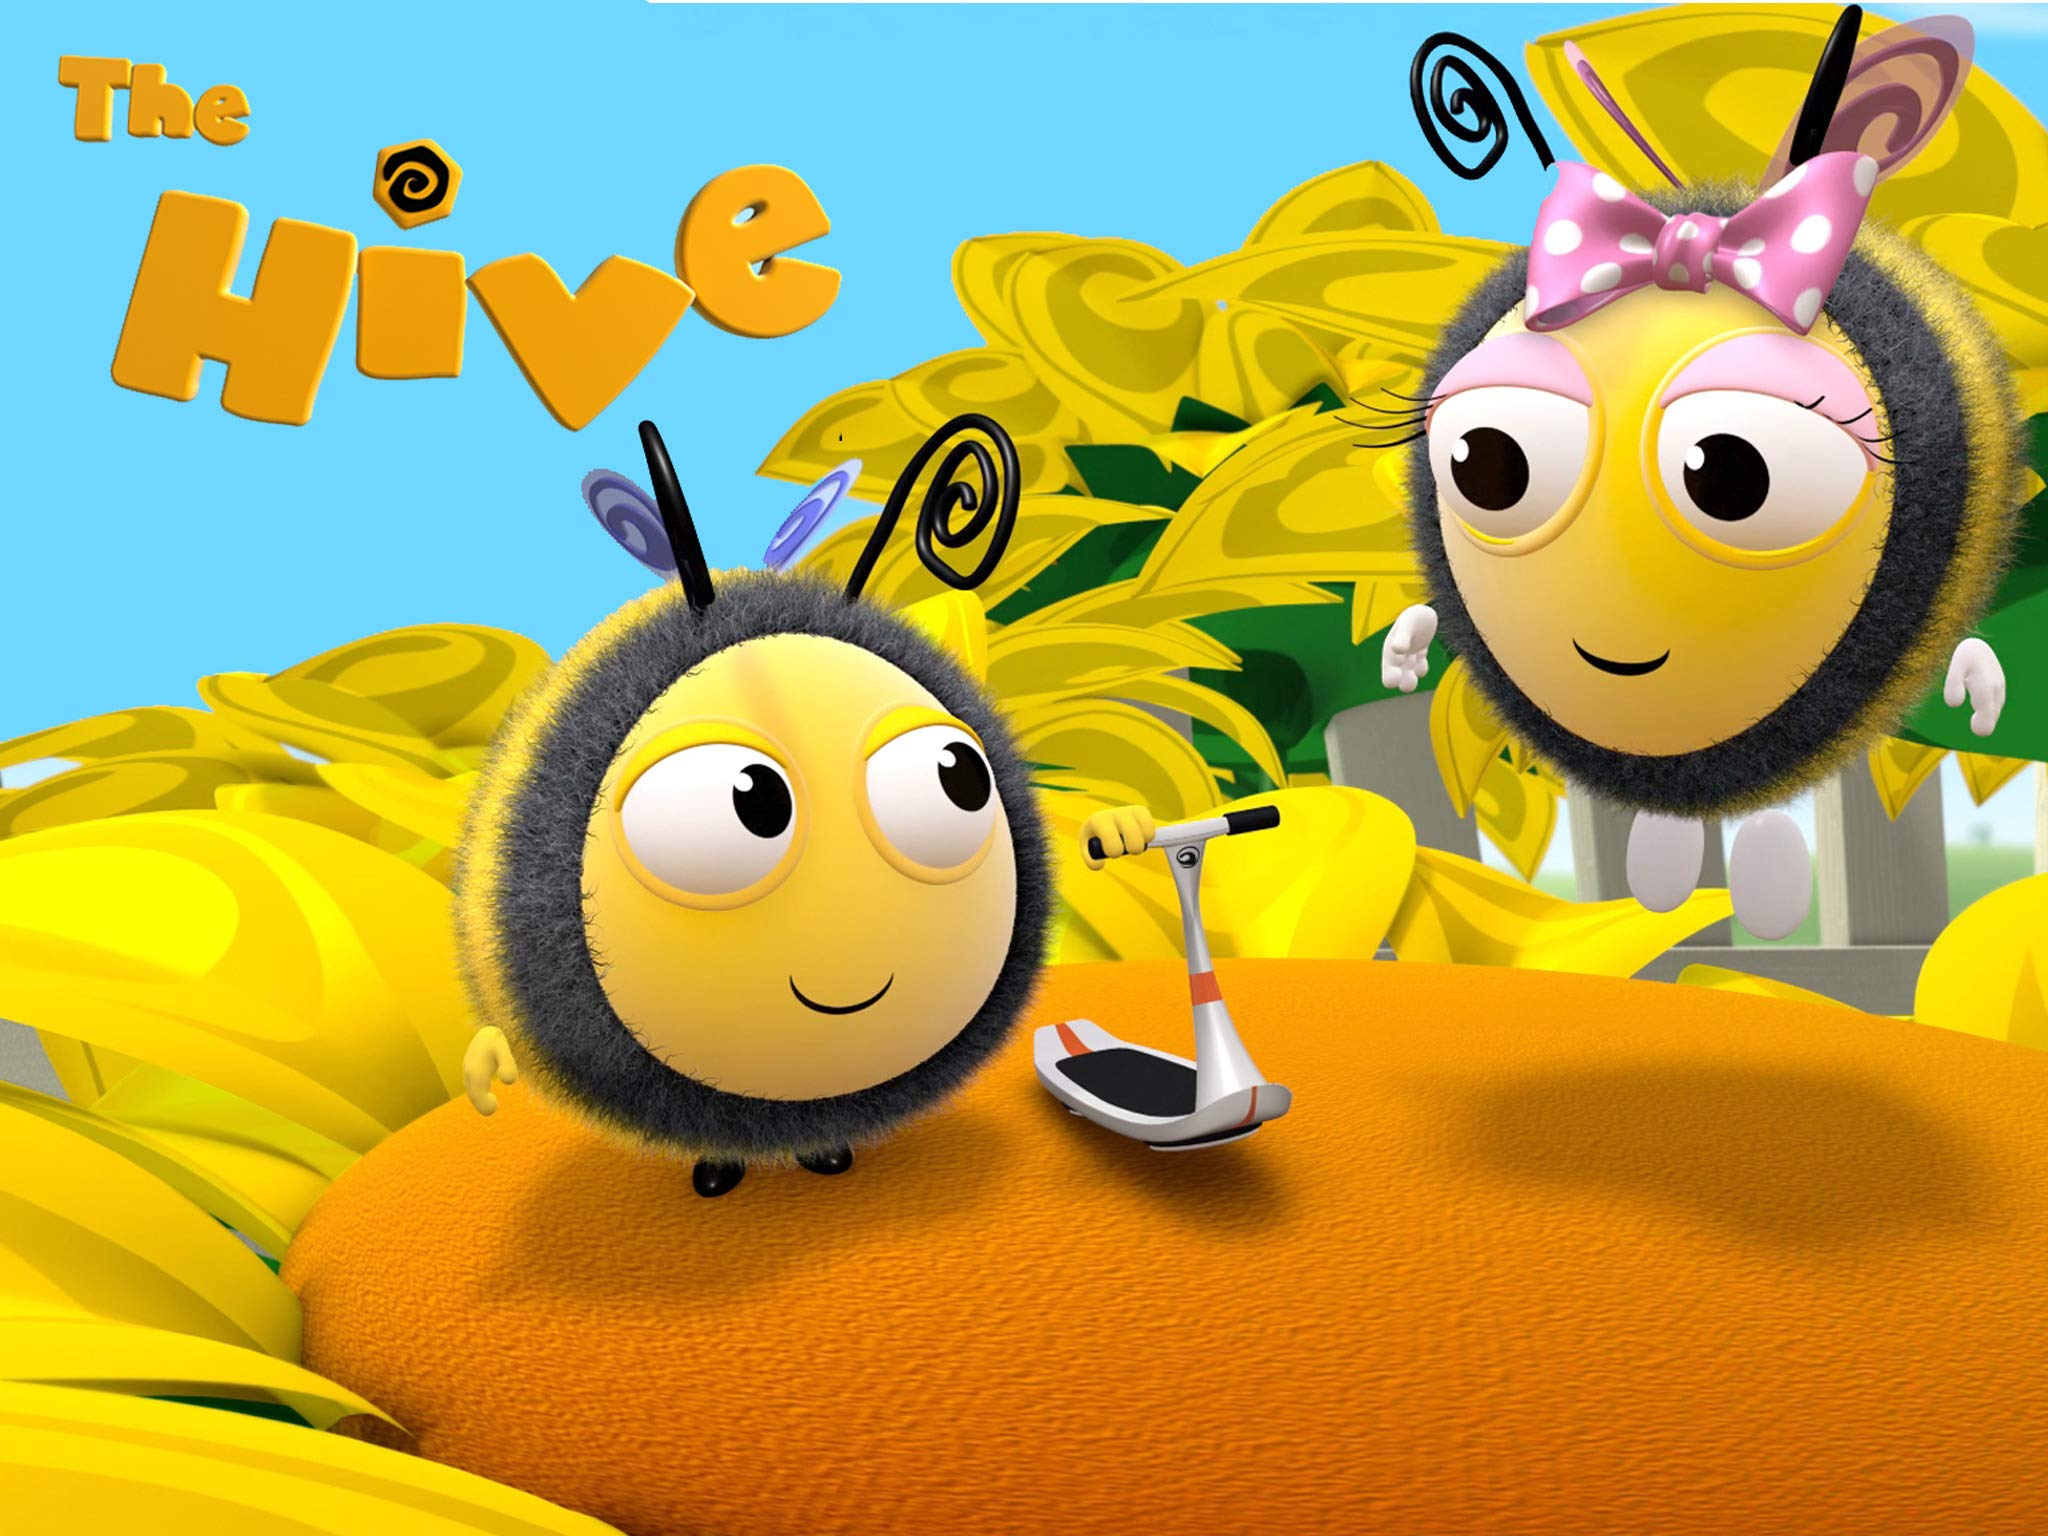 Amazon.com: The Hive - Season 1